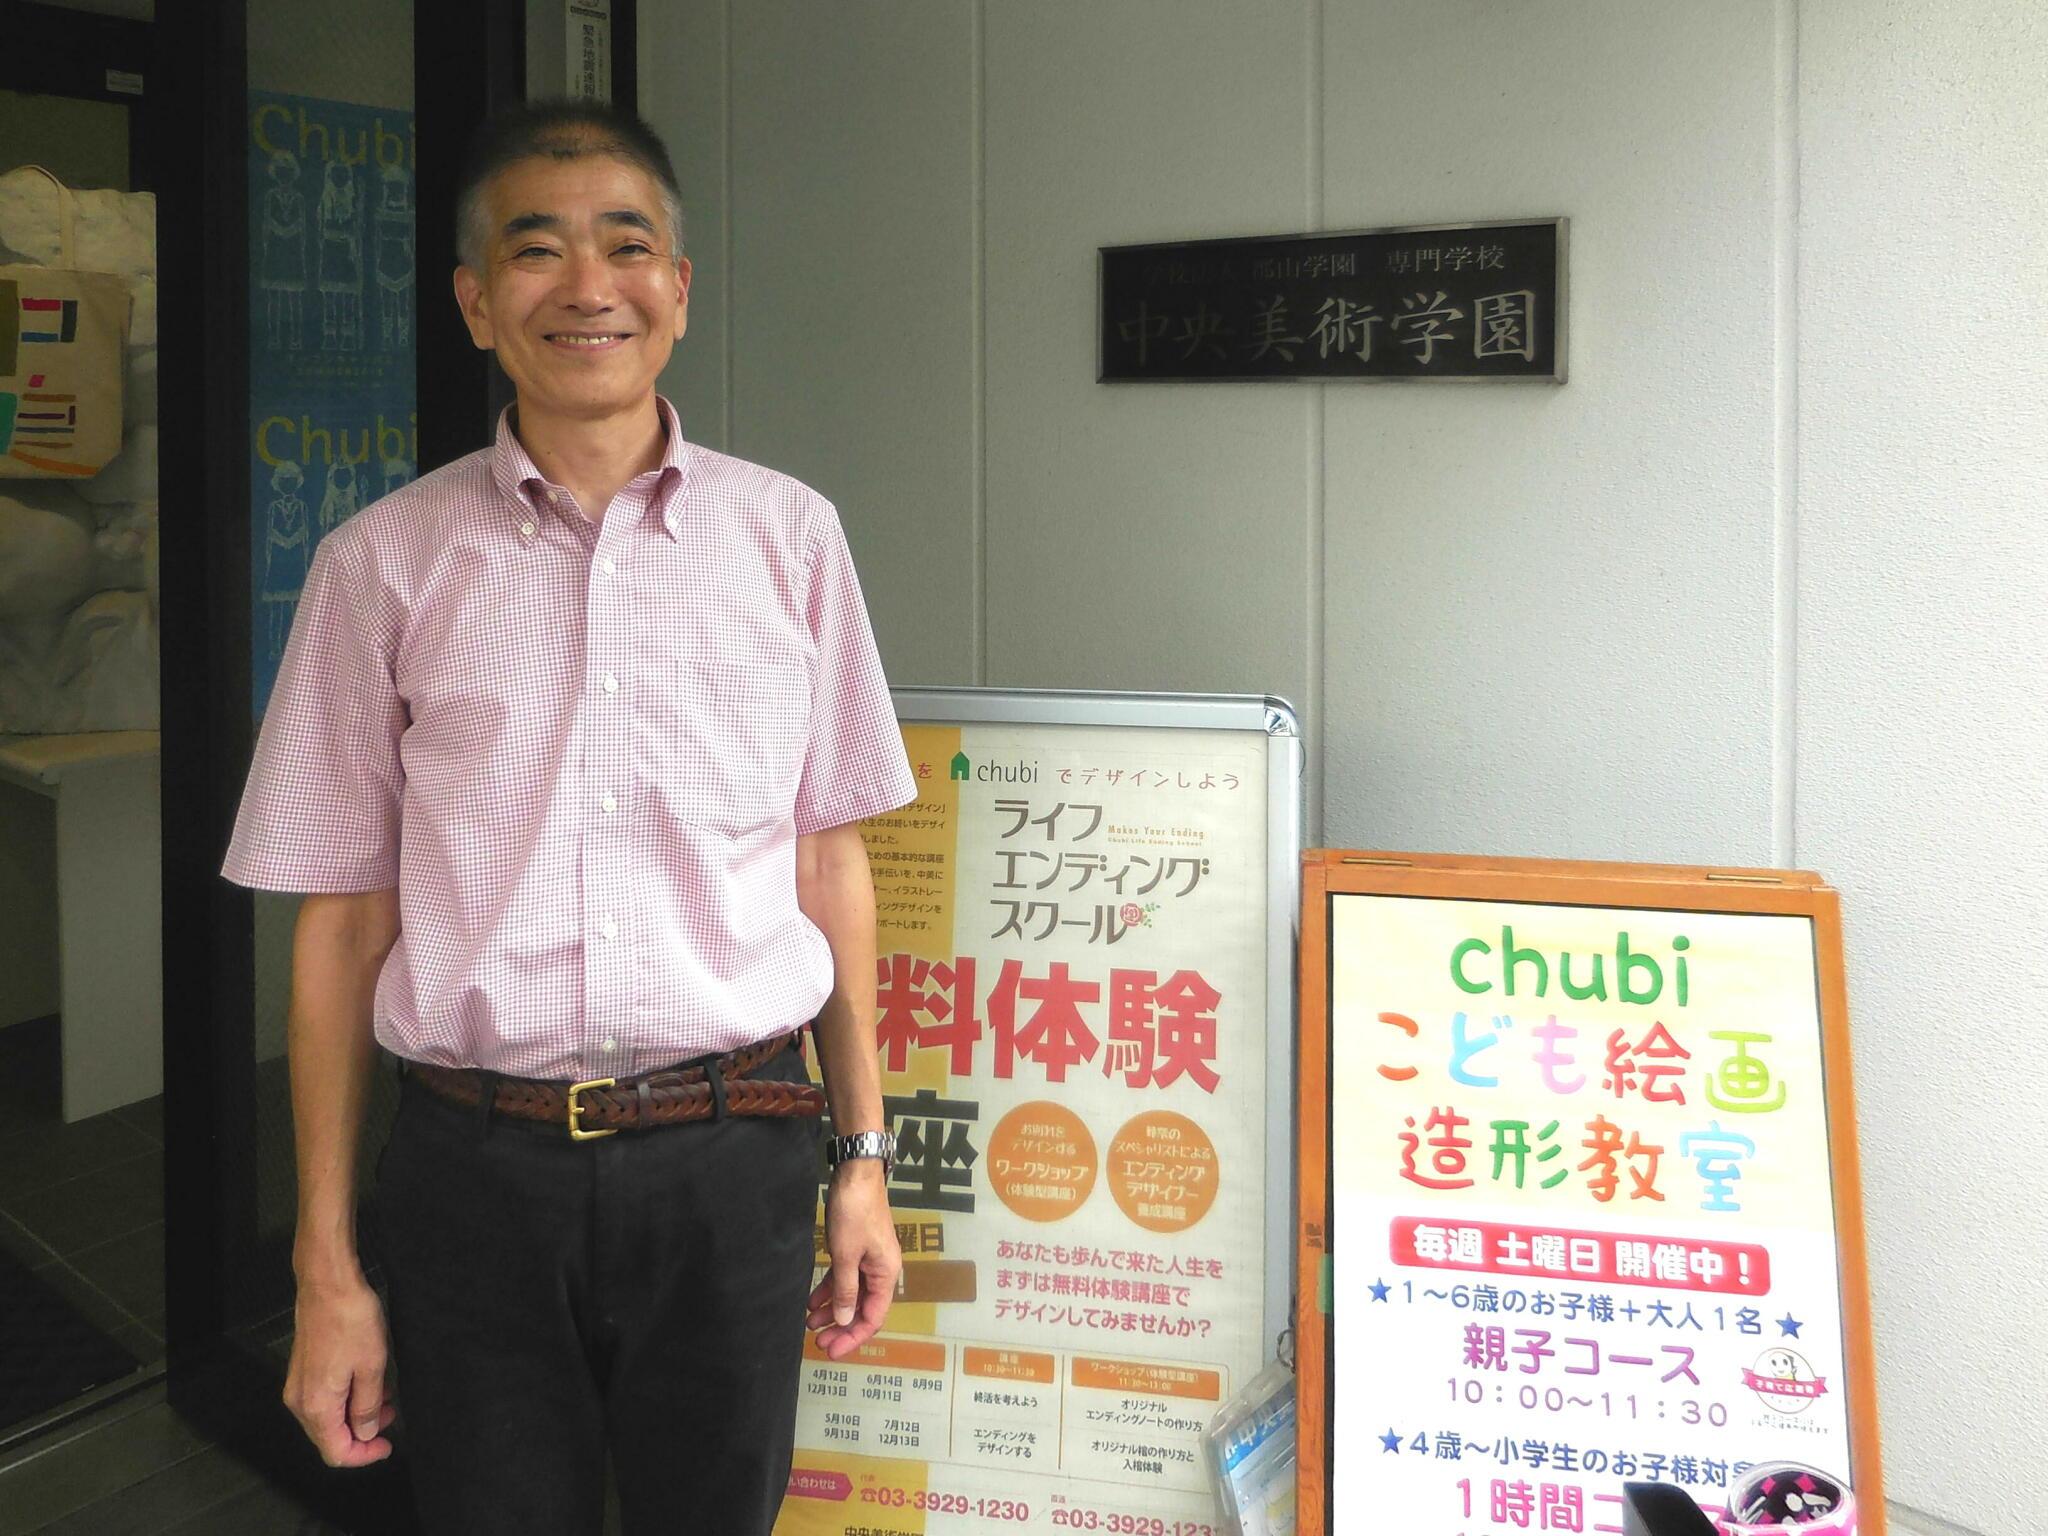 http://842fm.west-tokyo.co.jp/fm842/images/Chubi-B.jpg